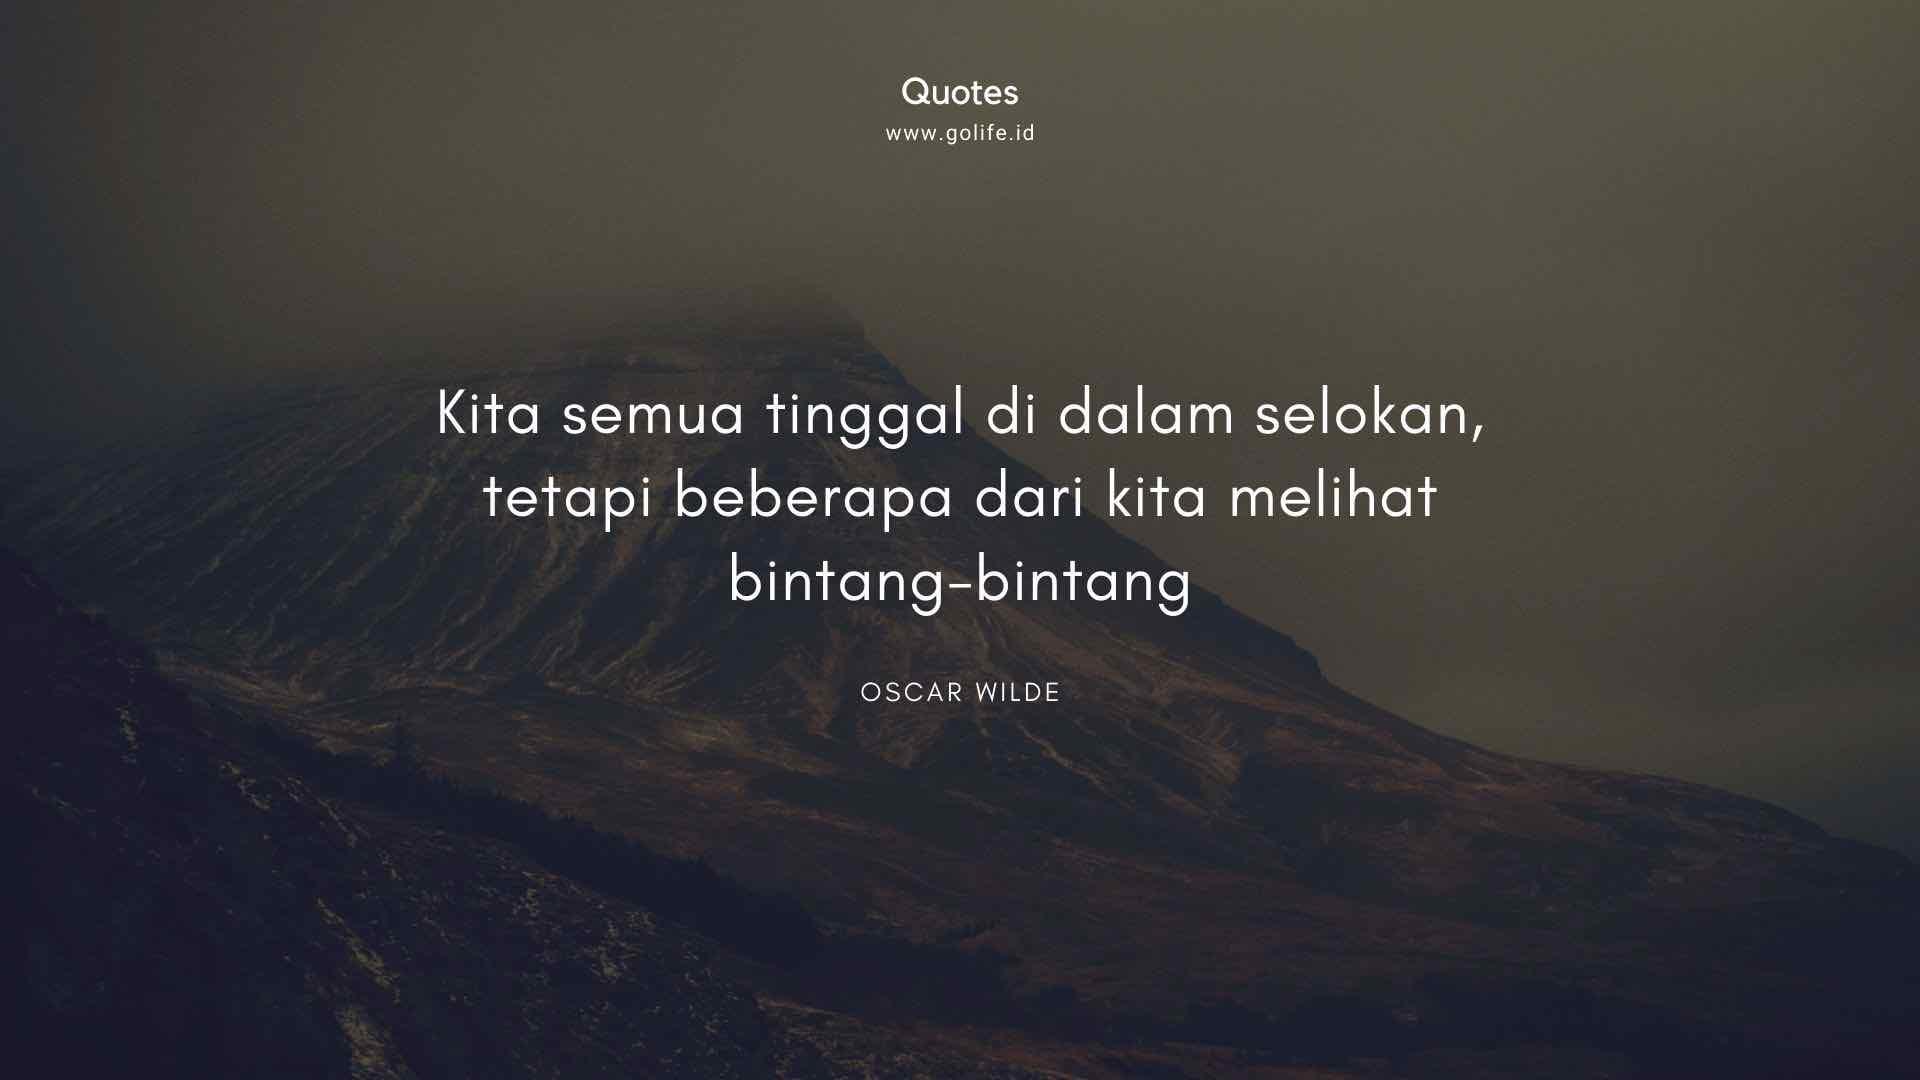 Quotes Oscar Wilde Tentang Melihat Bintang-Bintang